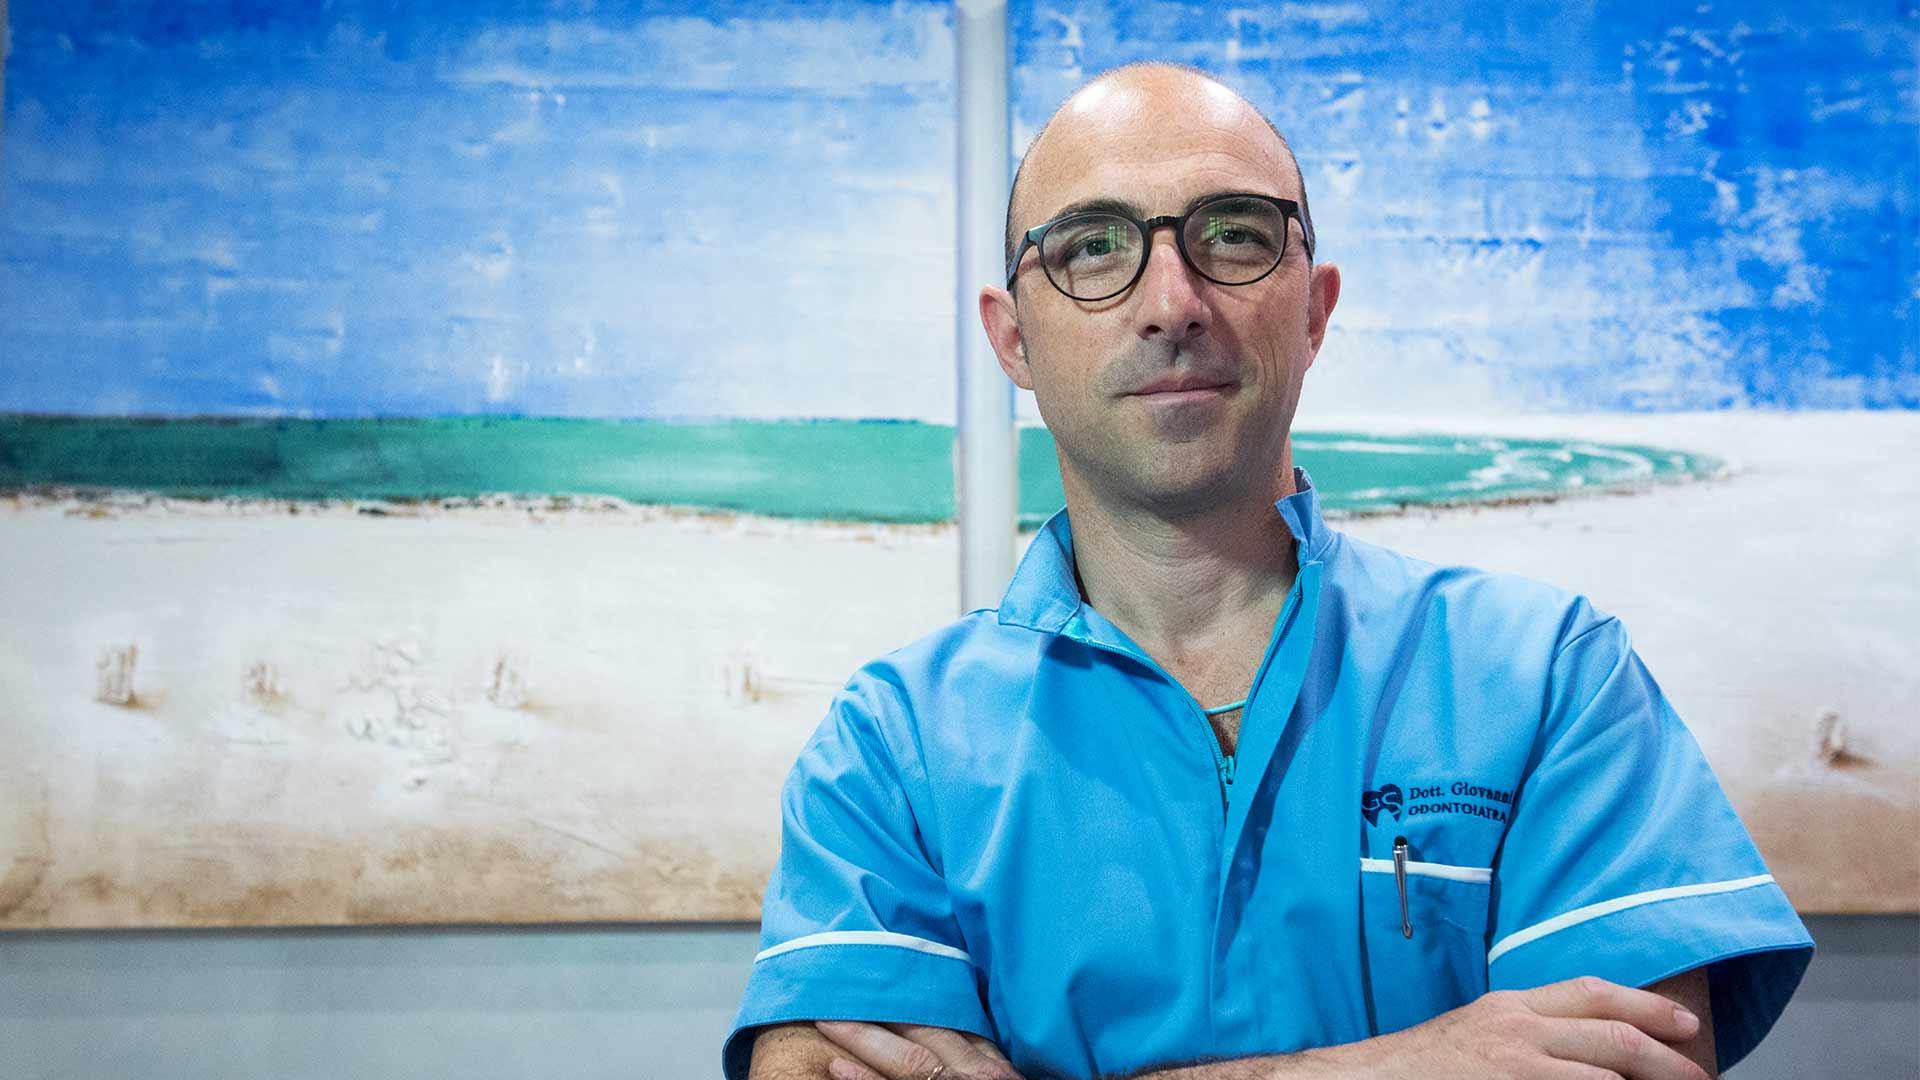 Studio dentistico Spinosa 5 | Dentista a Gaeta